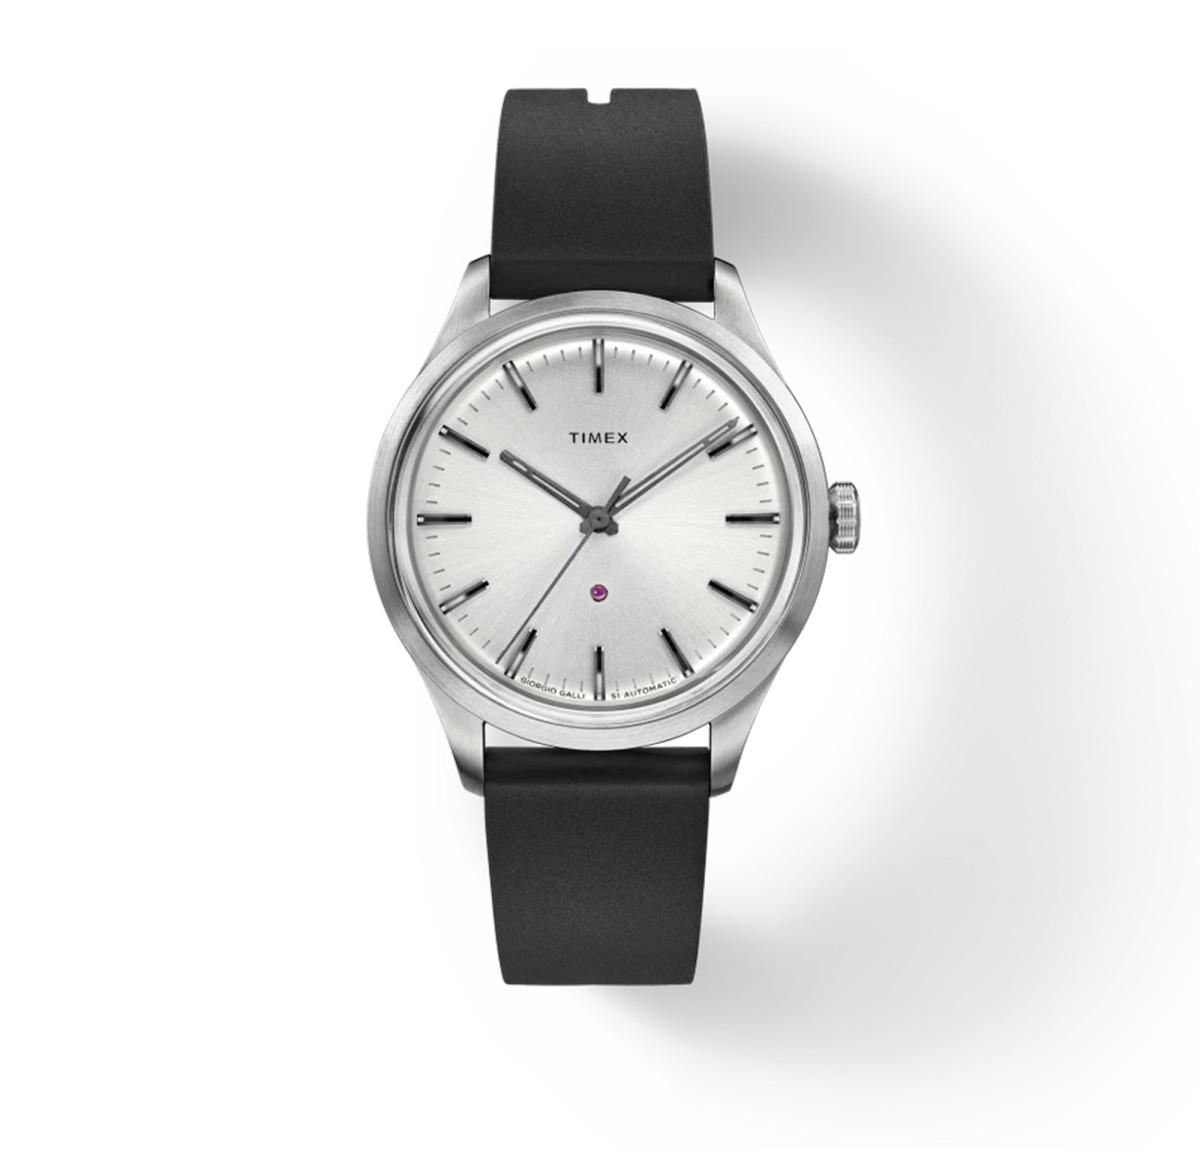 Timex Giorgio Galli